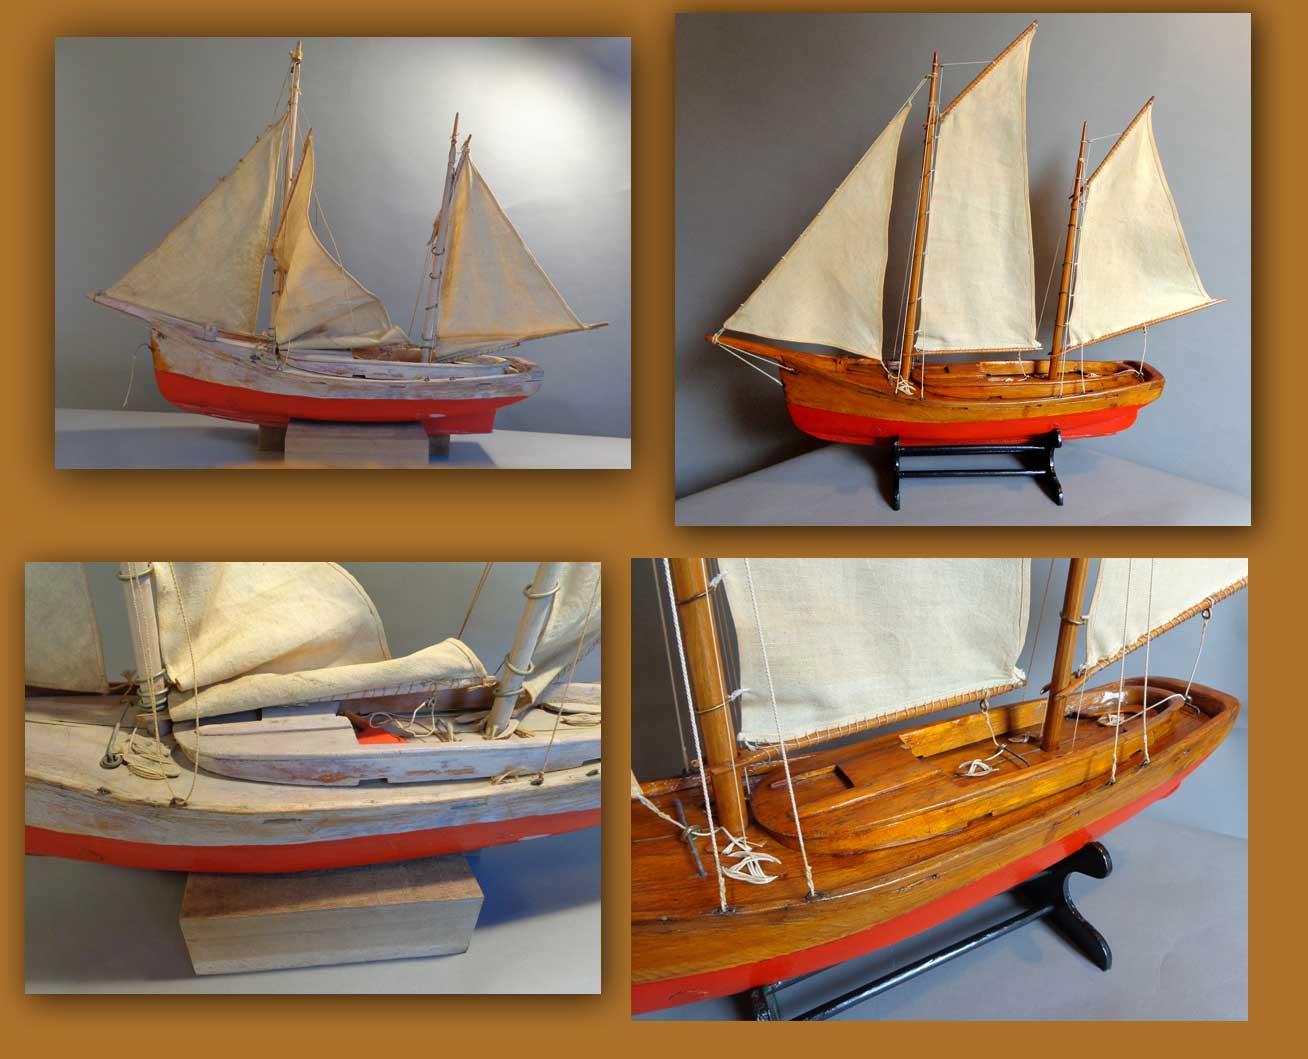 Pond Yacht rigging - Masting, rigging and sails - Model Ship World